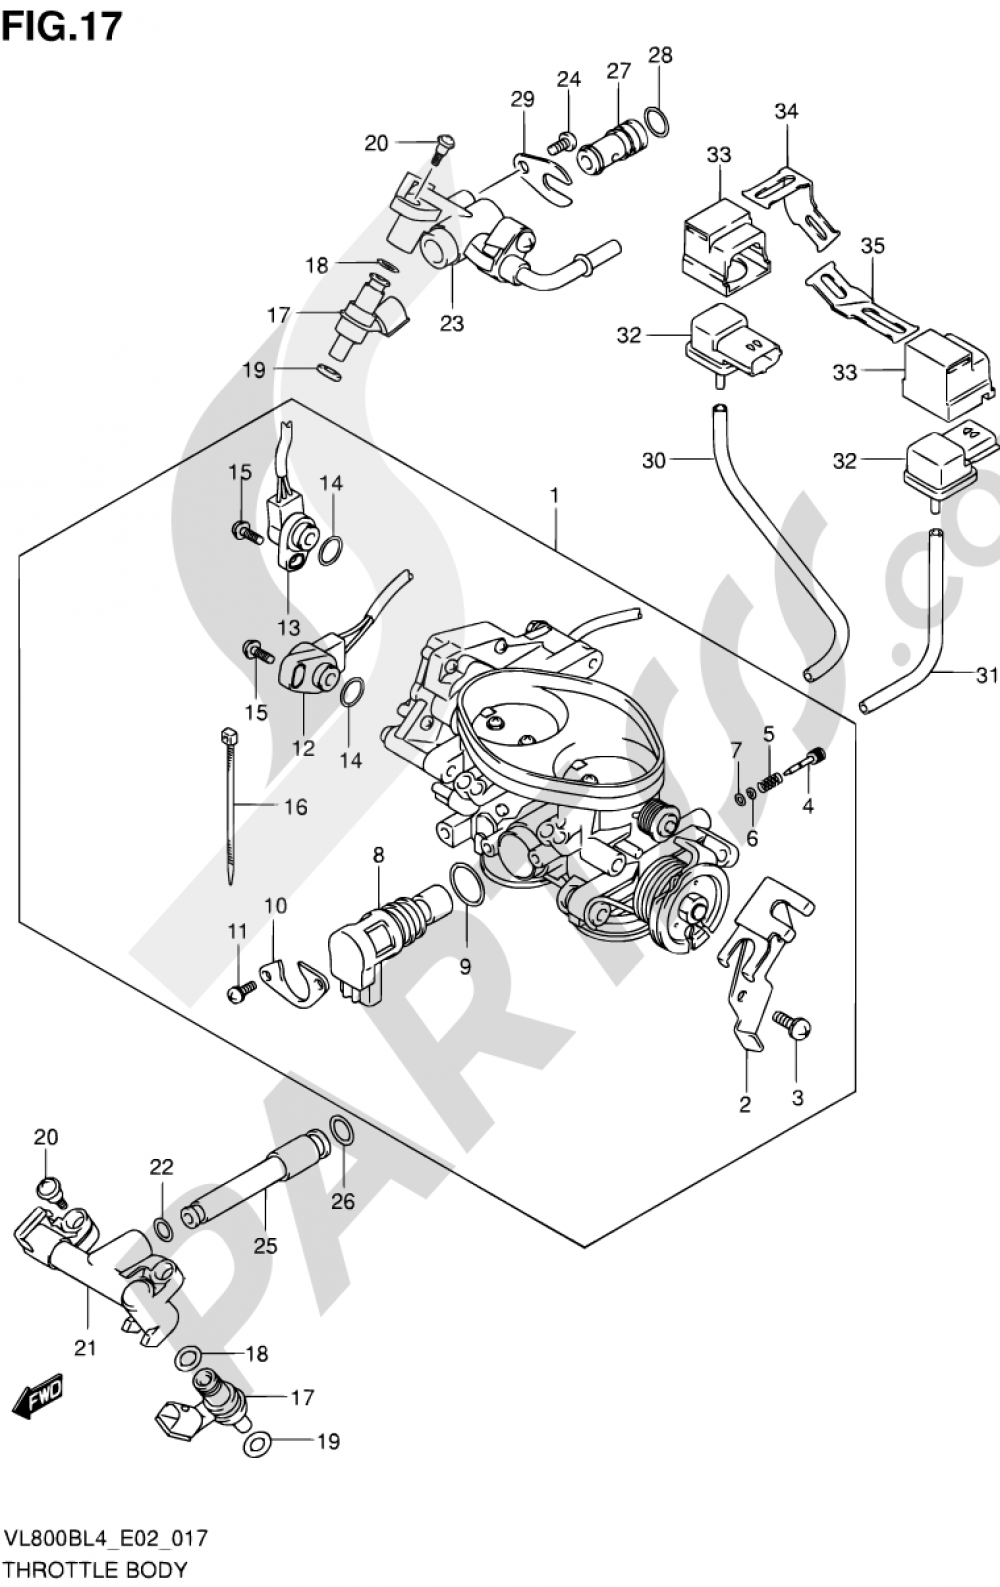 17 - THROTTLE BODY (VL800BL4 E02) Suzuki INTRUDER VL800 2014